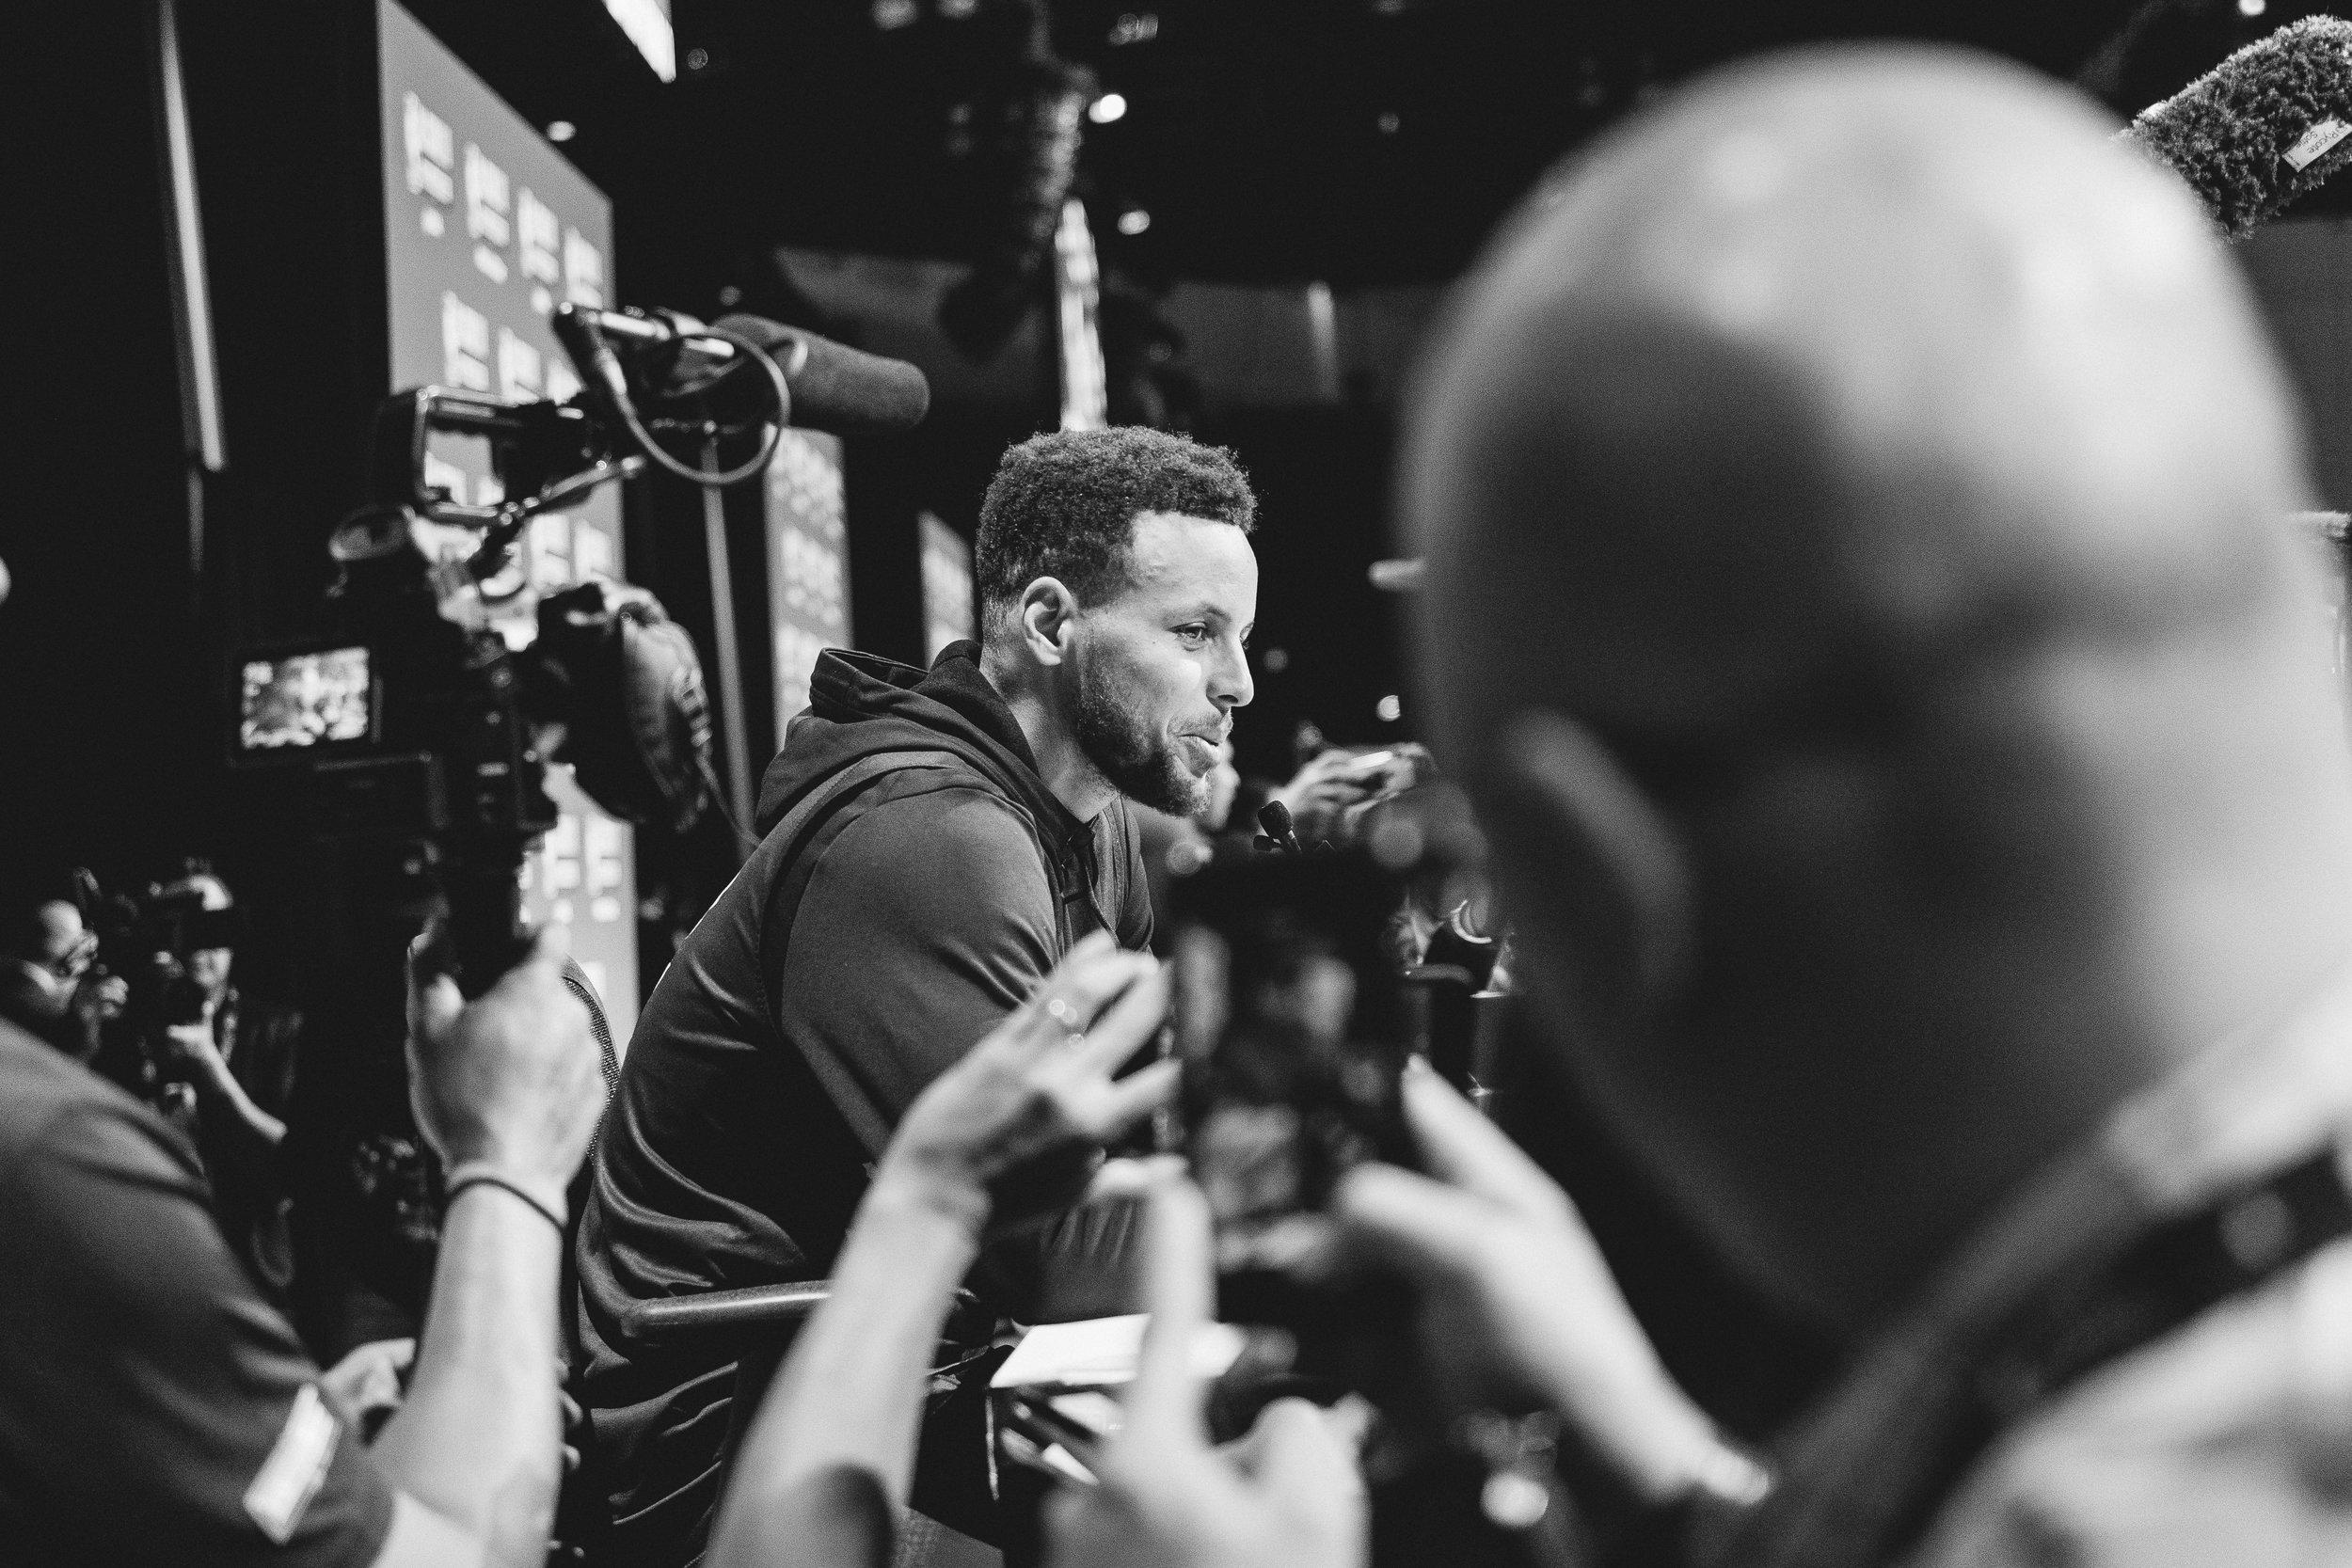 NBA_ALL_STAR_MEDIA_DAYKENNETH_STGEORGE_PHOTOGRAPHY_2018-110.jpg